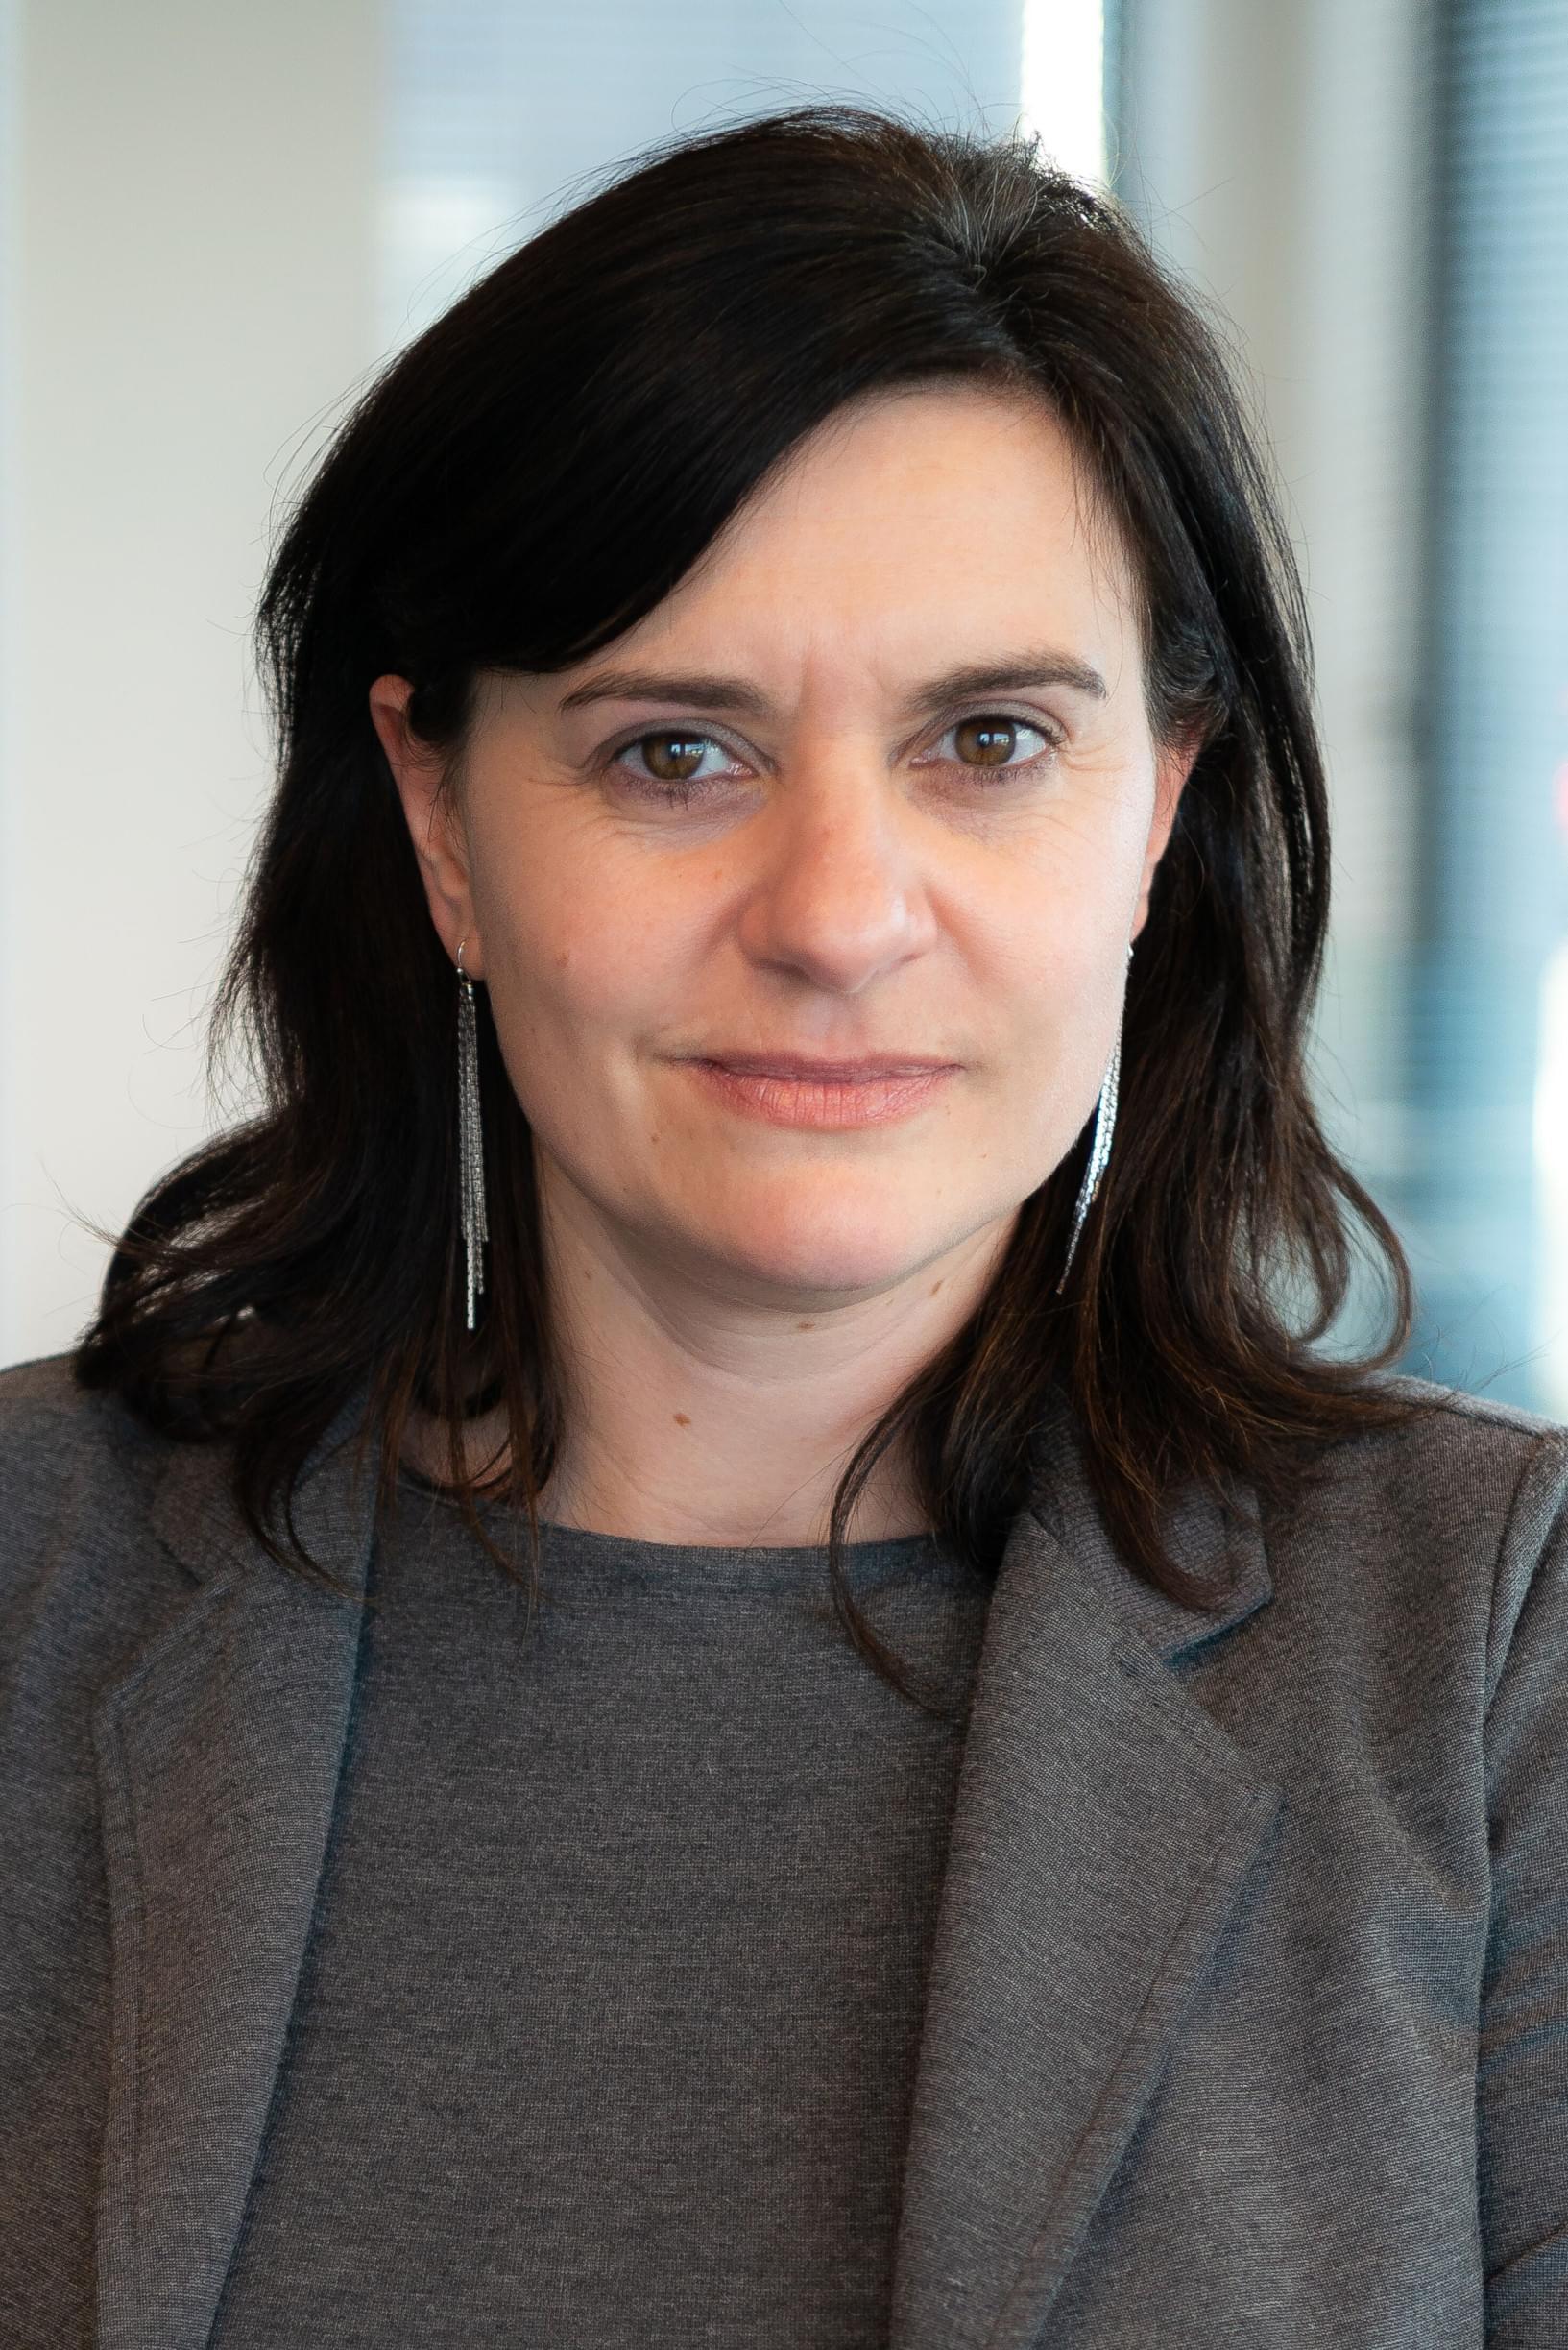 Liese Van Dyck - Senior Projectmanager